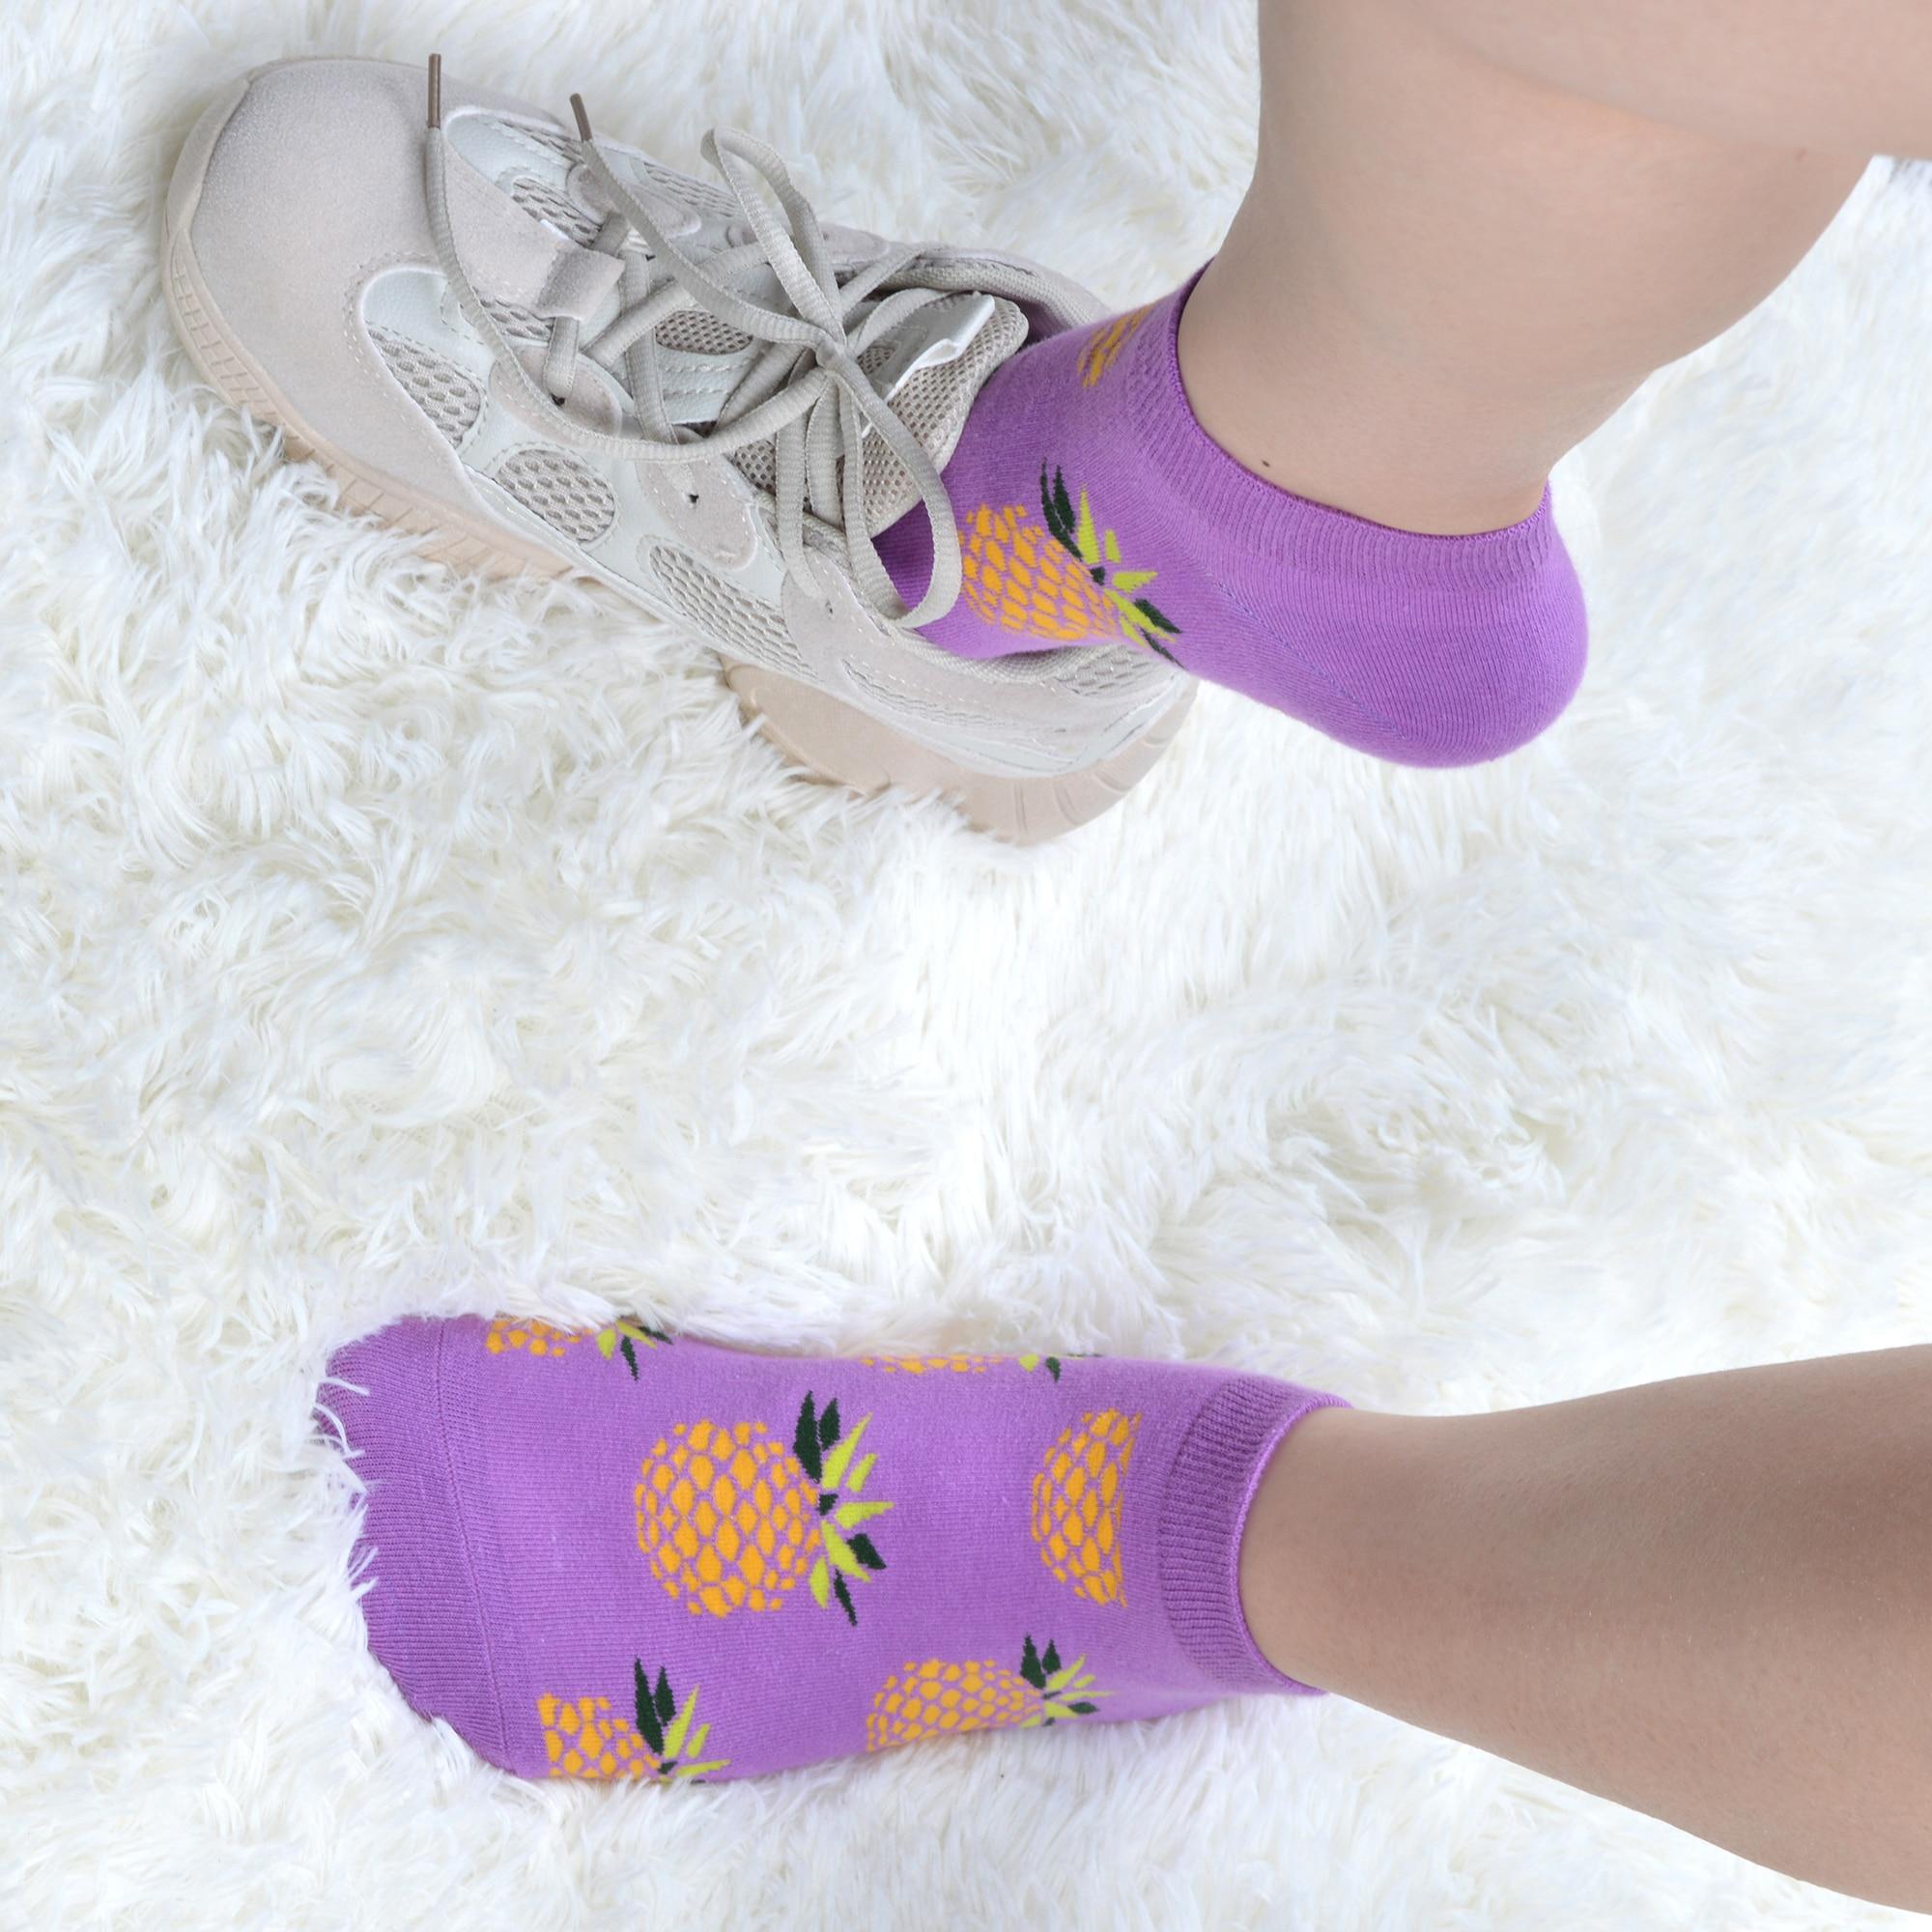 Image 5 - SANZETTI 12 Pairs/Lot Women Summer Casual Colorful Ankle Socks Happy Combed Cotton Short Socks Novelty Pattern Boat Gifts Socks-in Socks from Underwear & Sleepwears